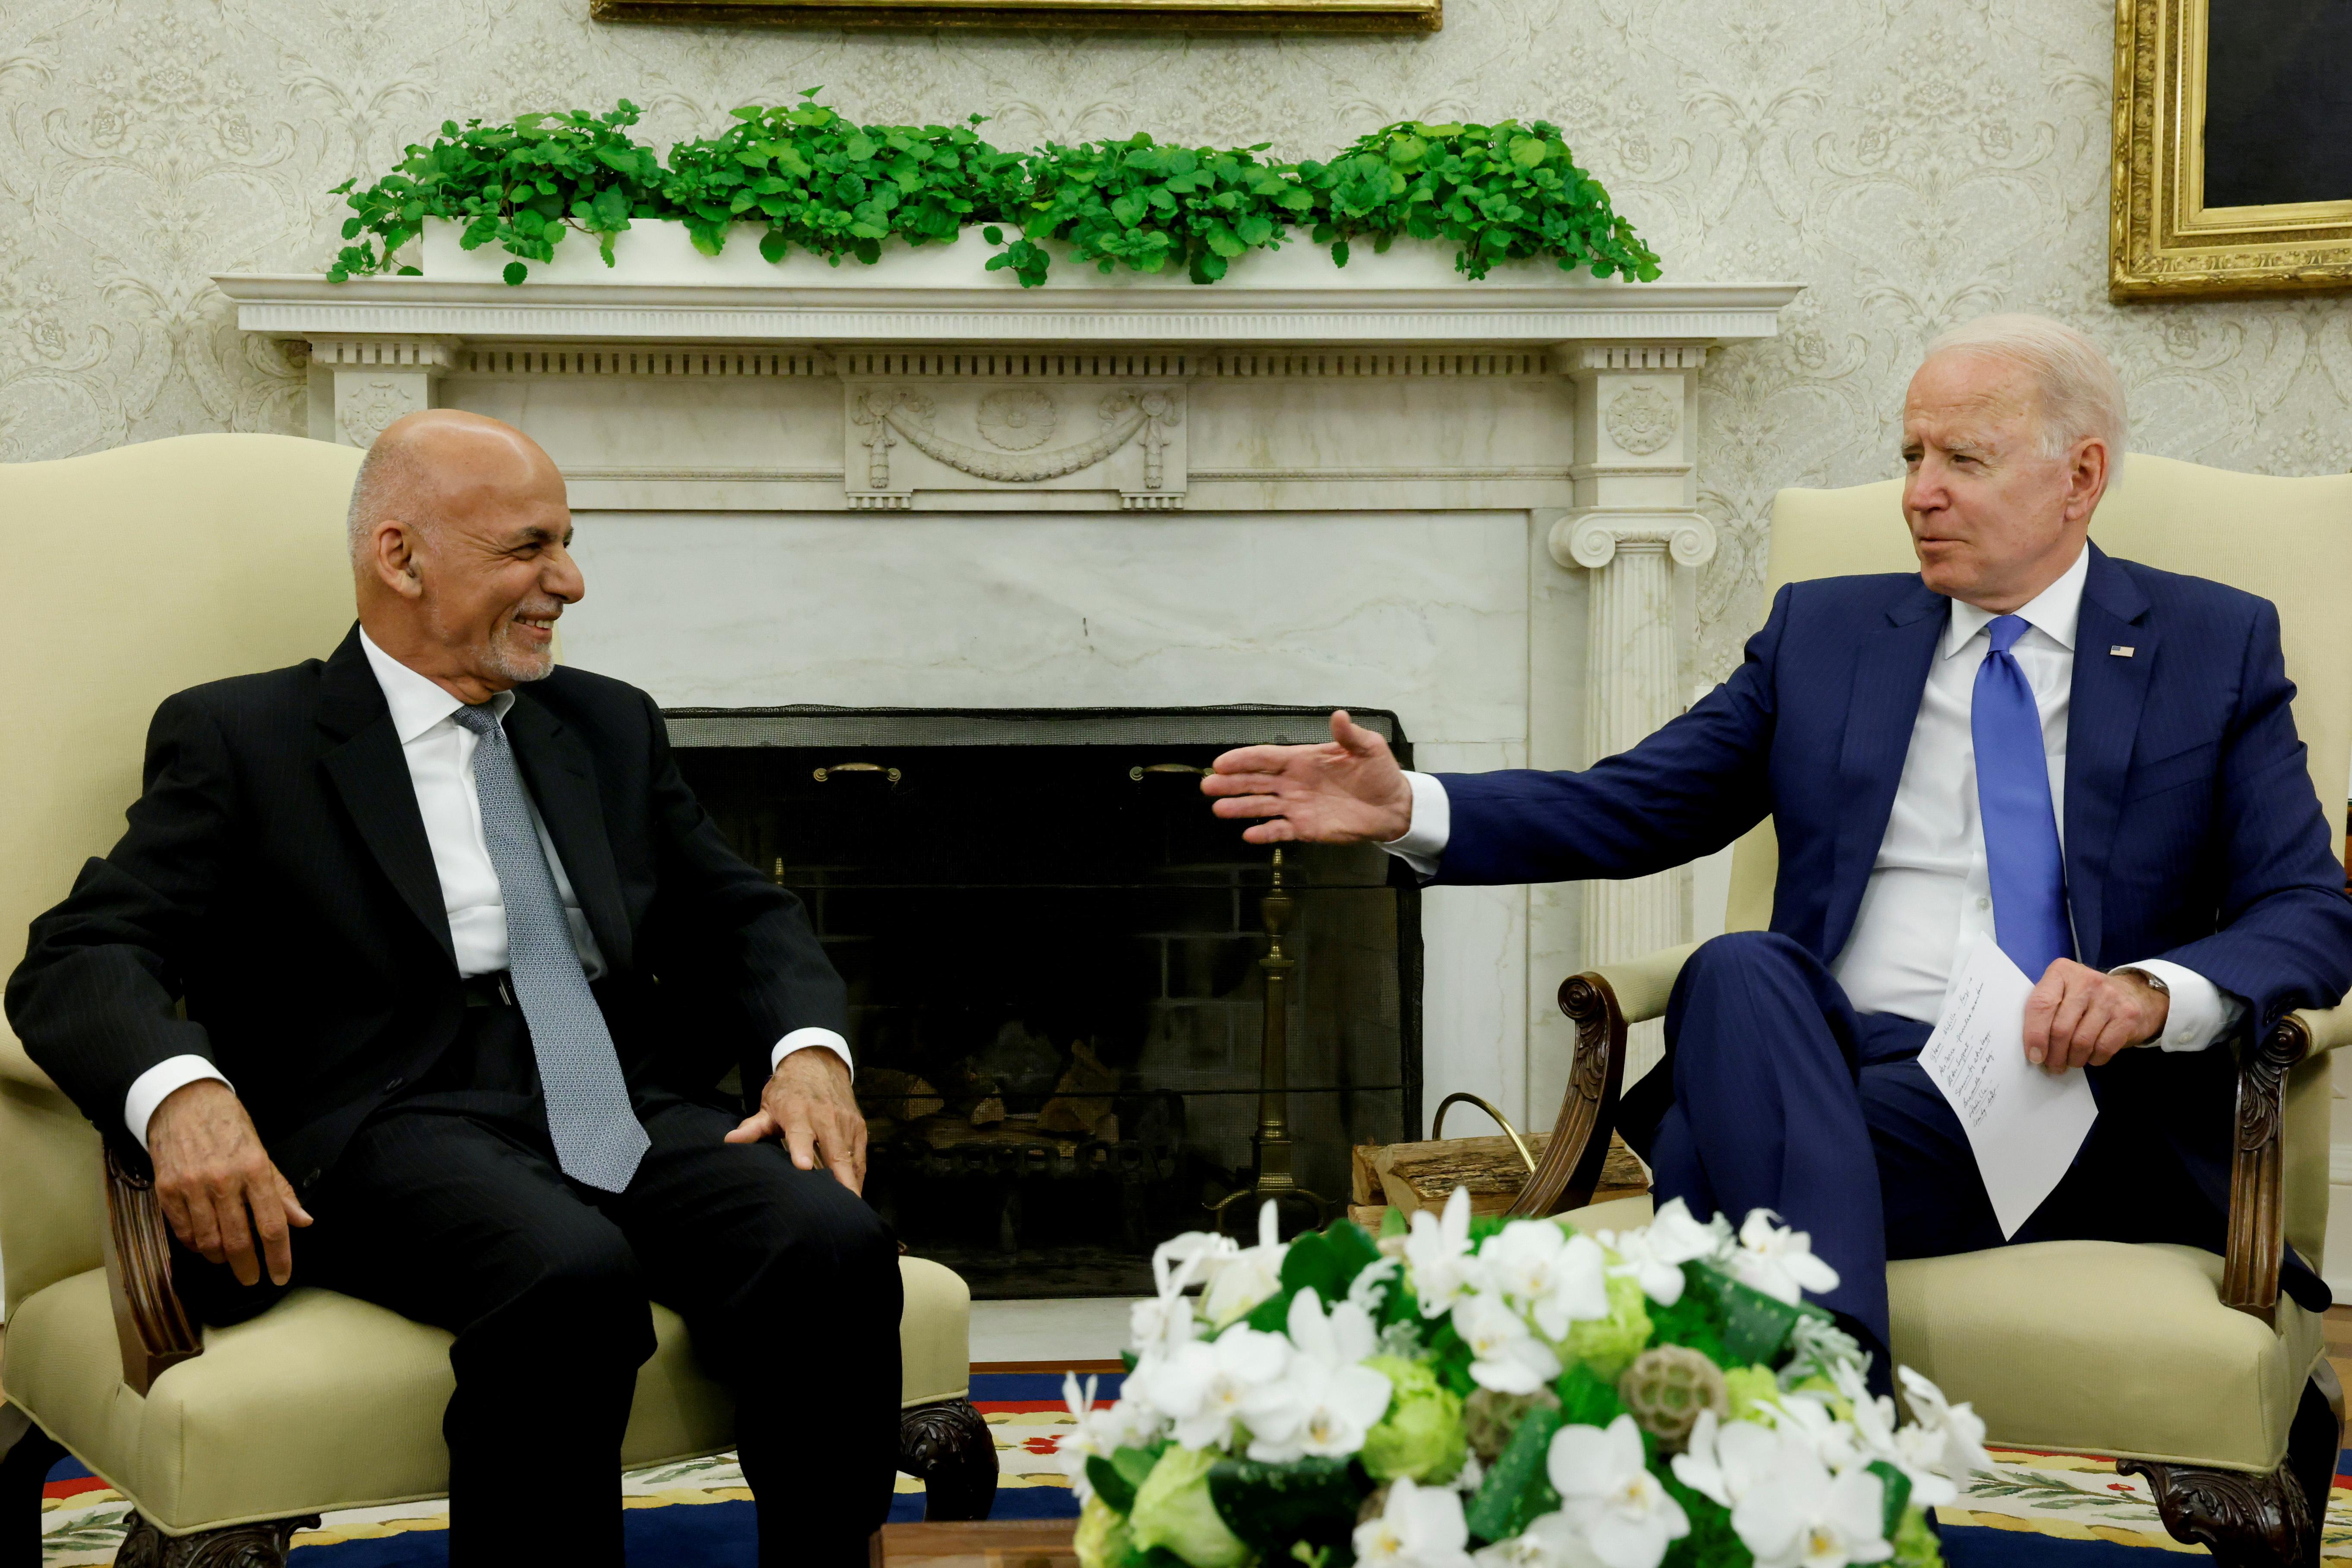 U.S. President Joe Biden meets with Afghan President Ashraf Ghani at the White House, in Washington, U.S., June 25, 2021. REUTERS/Jonathan Ernst/File Photo